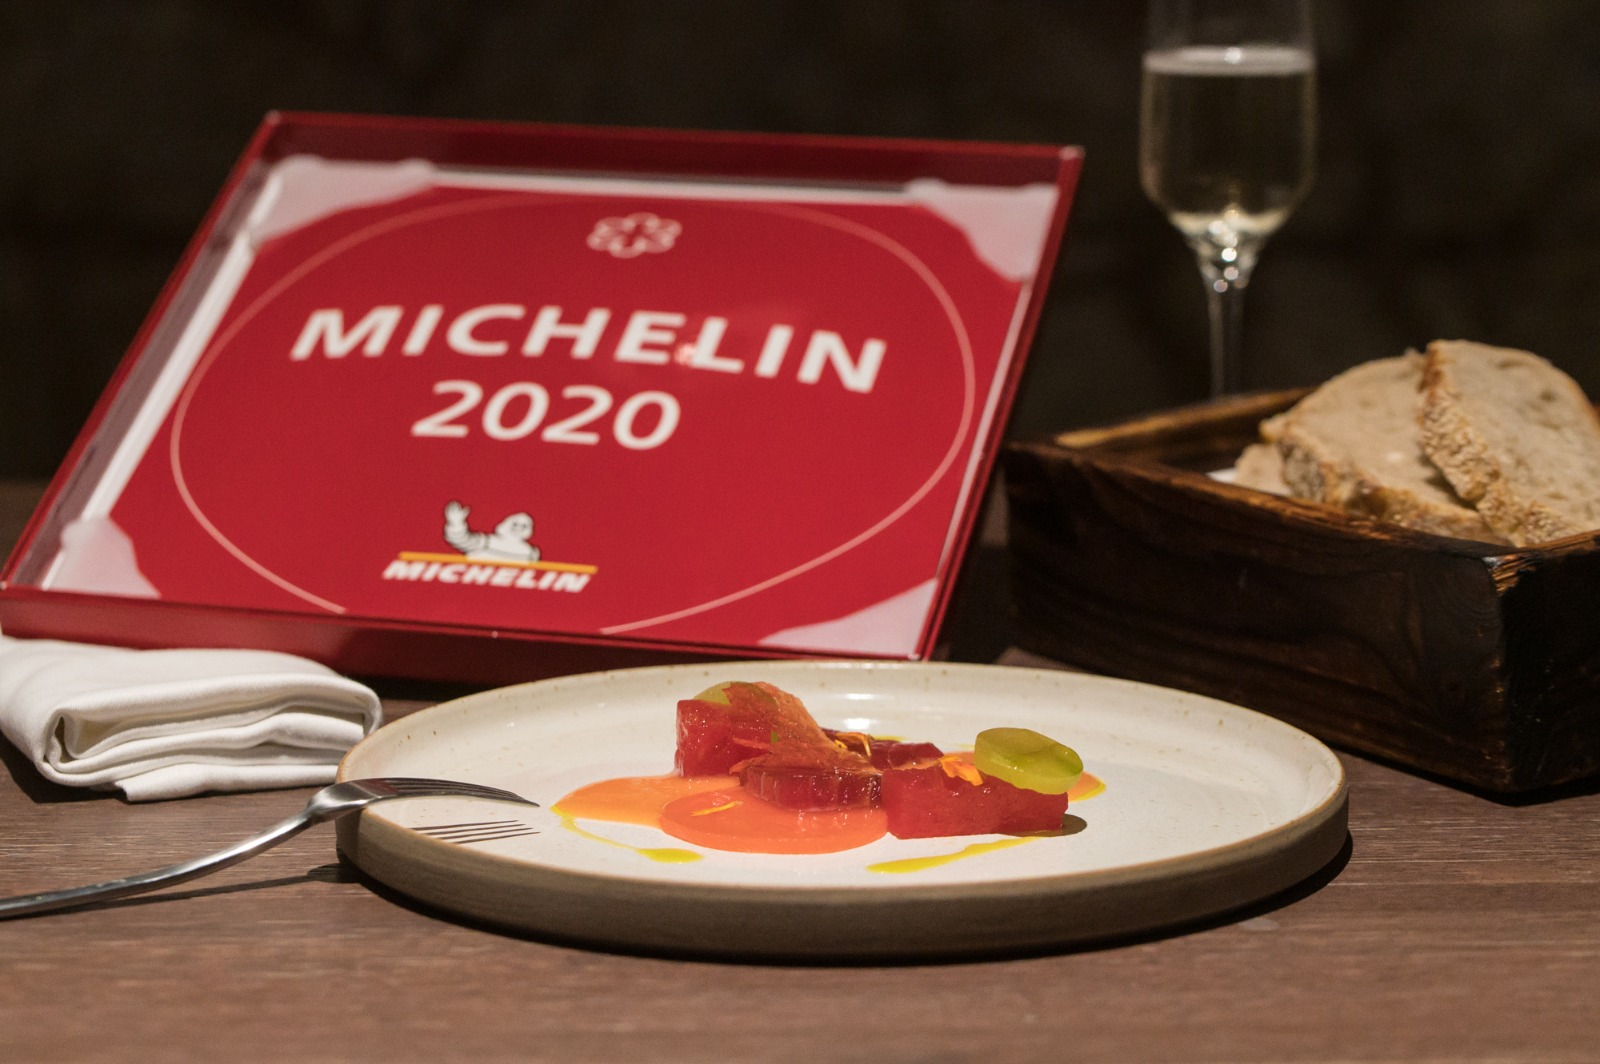 MICHELIN Presentation & Taste History